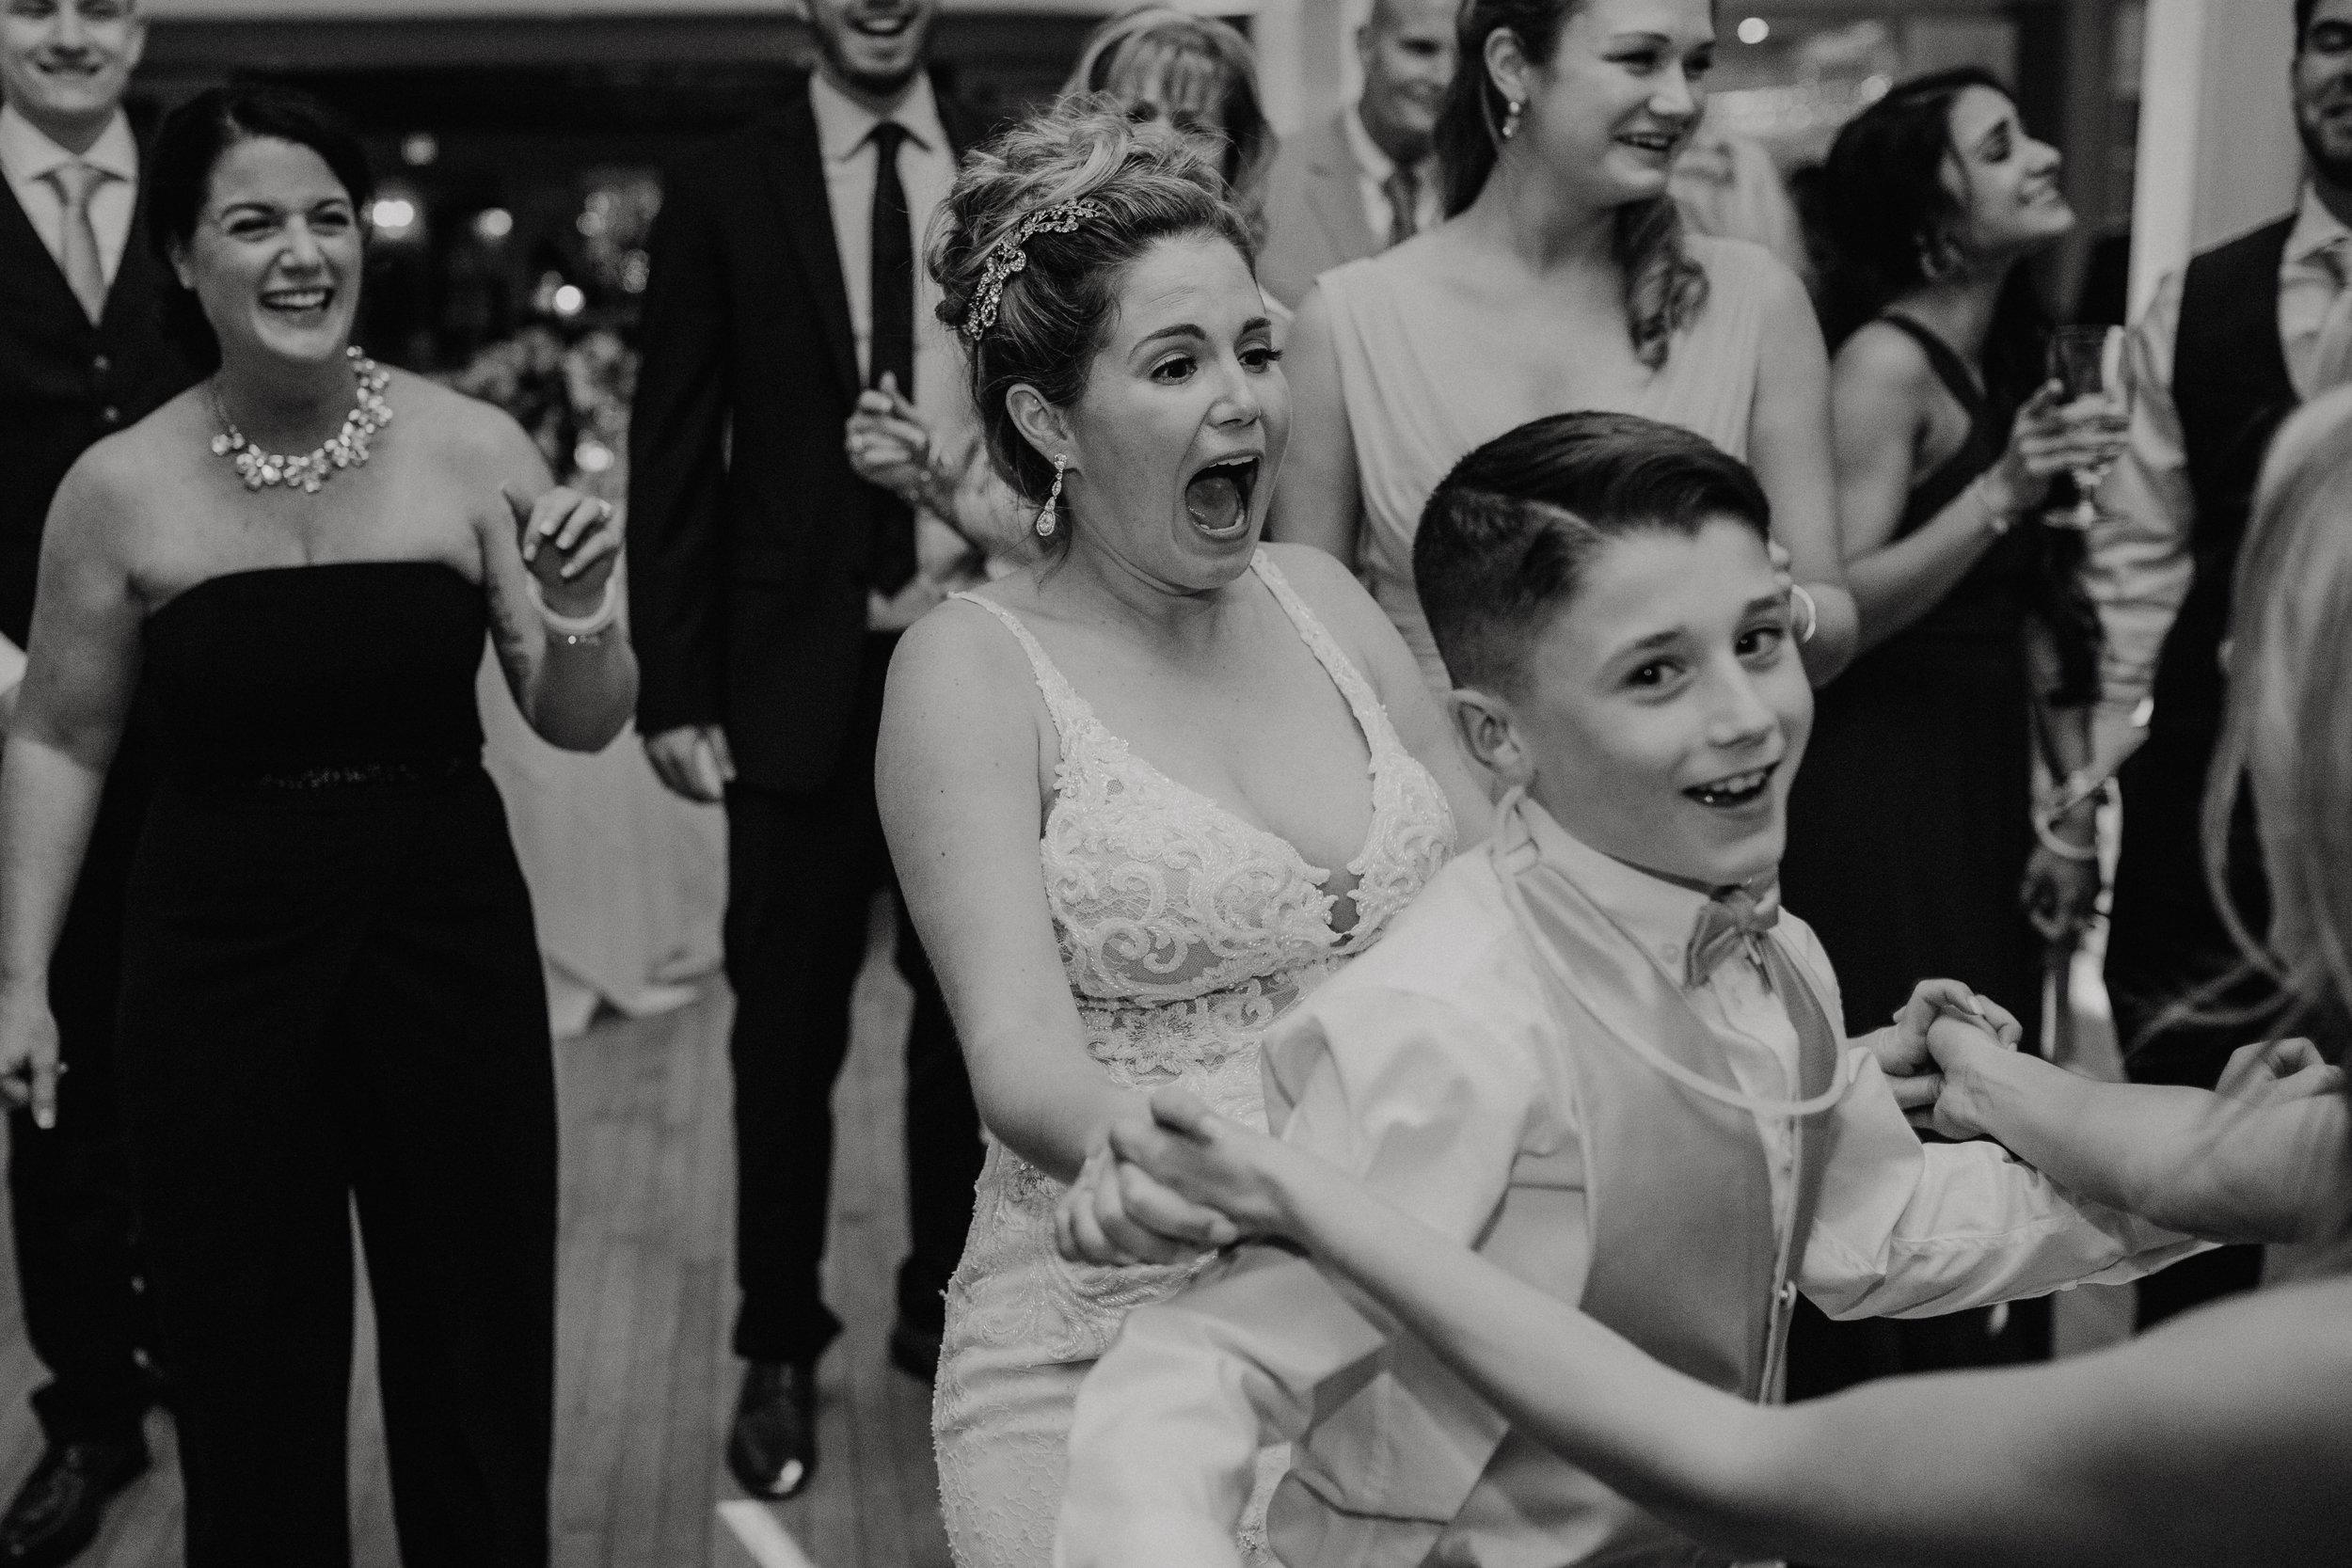 old_daley_on_crooked_lake_wedding_-115.jpg